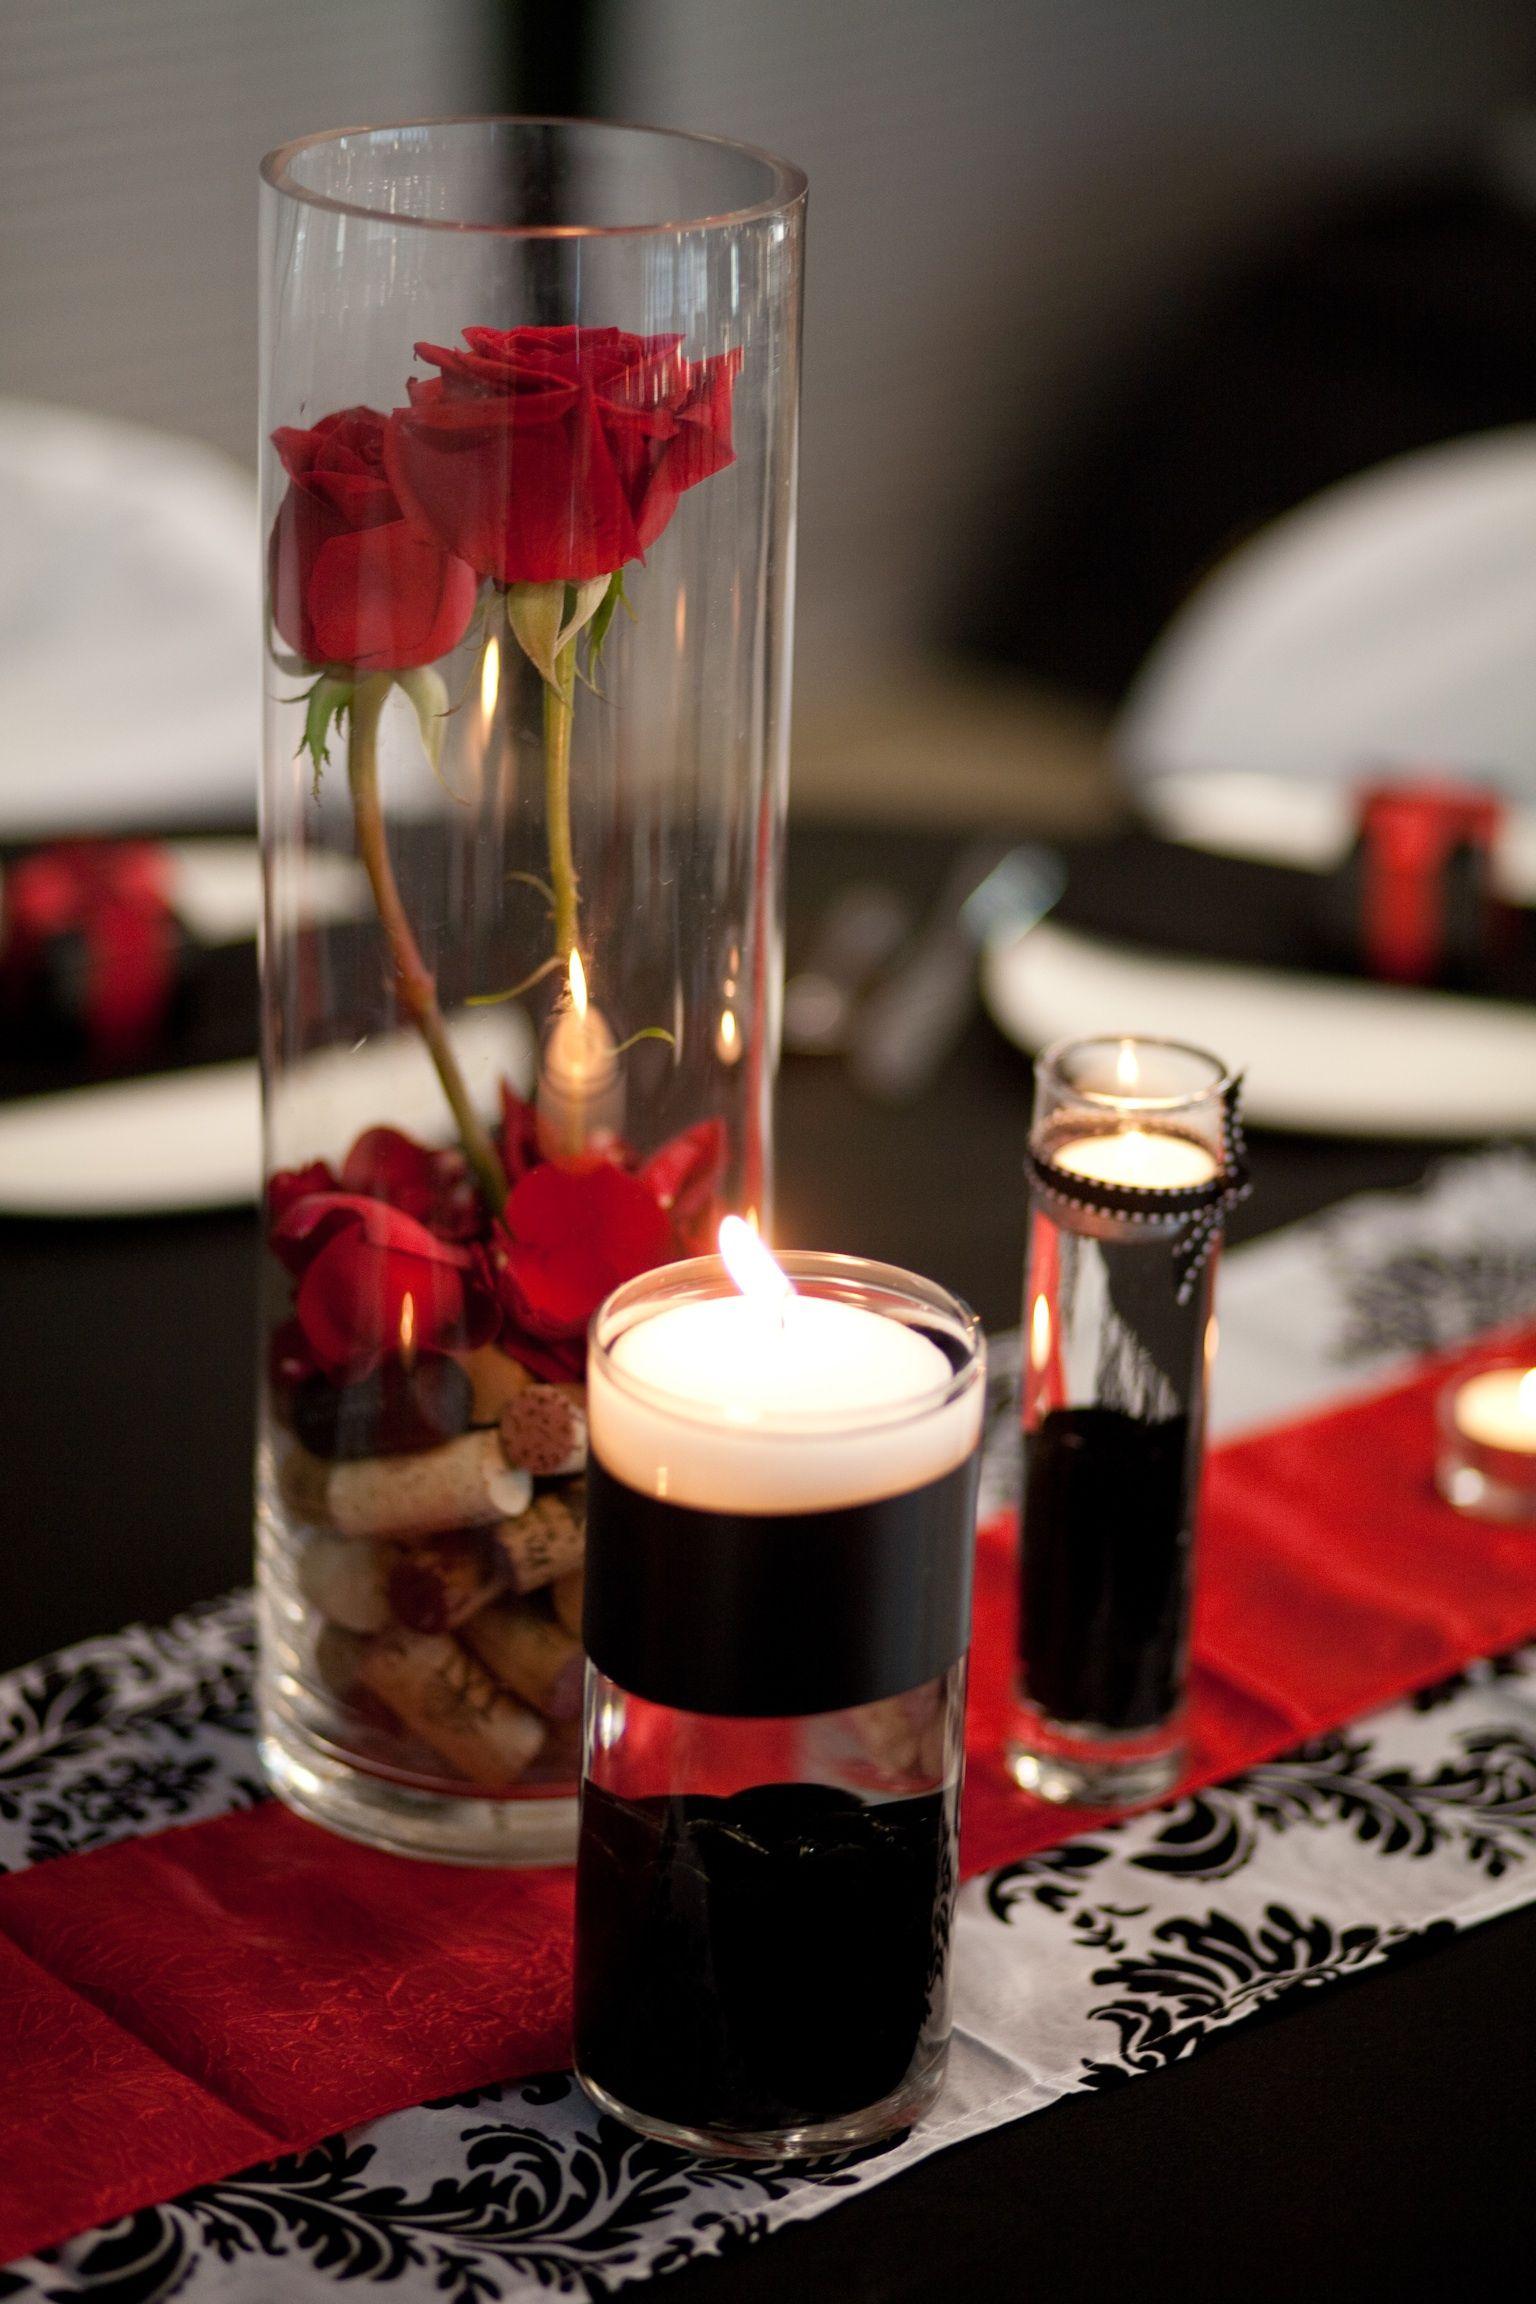 Wedding decoration ideas red and white  Red black white wine corks my wedding  Inspiring Ideas